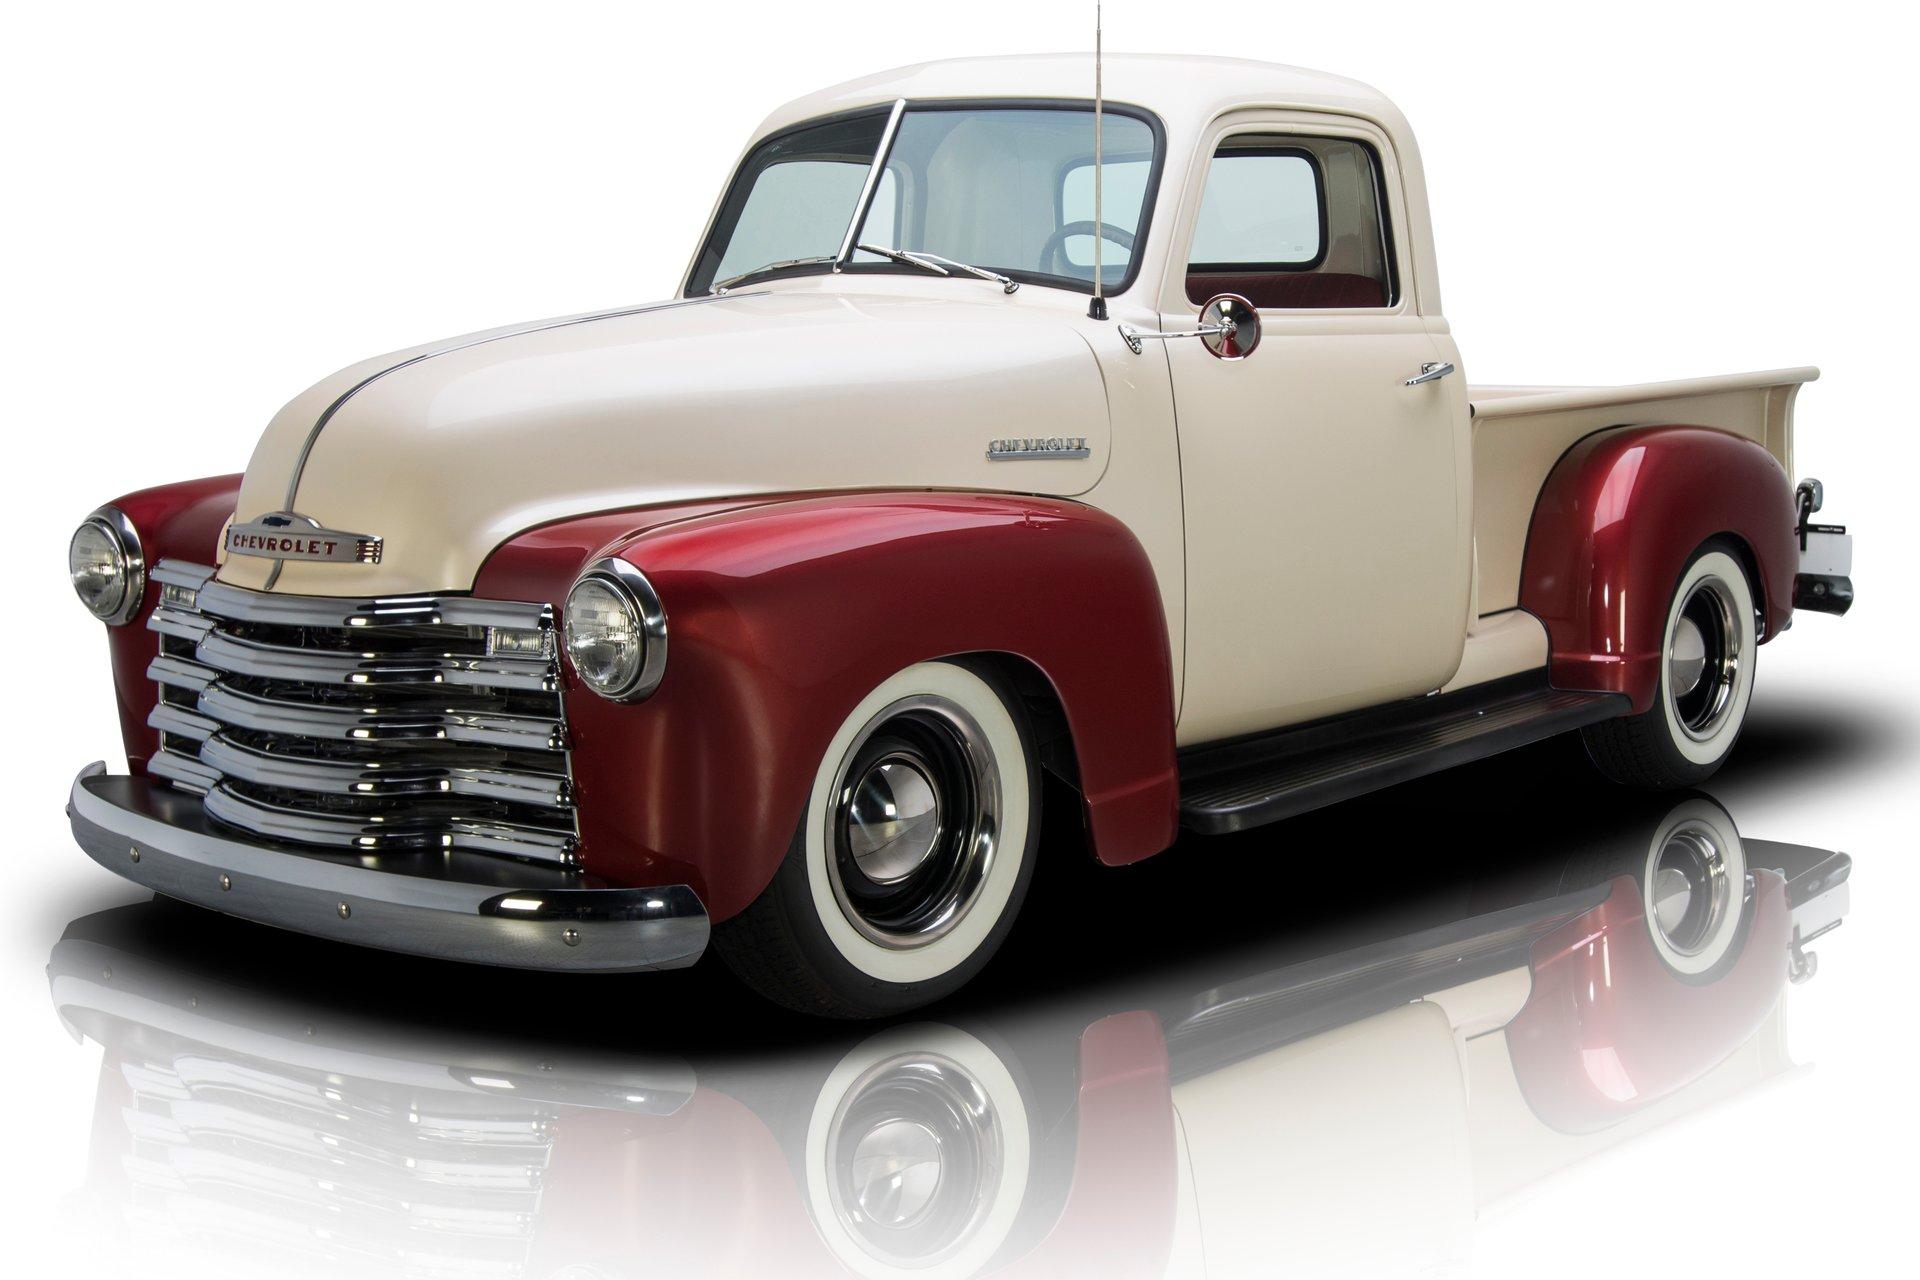 1949 chevrolet 3100 pickup truck